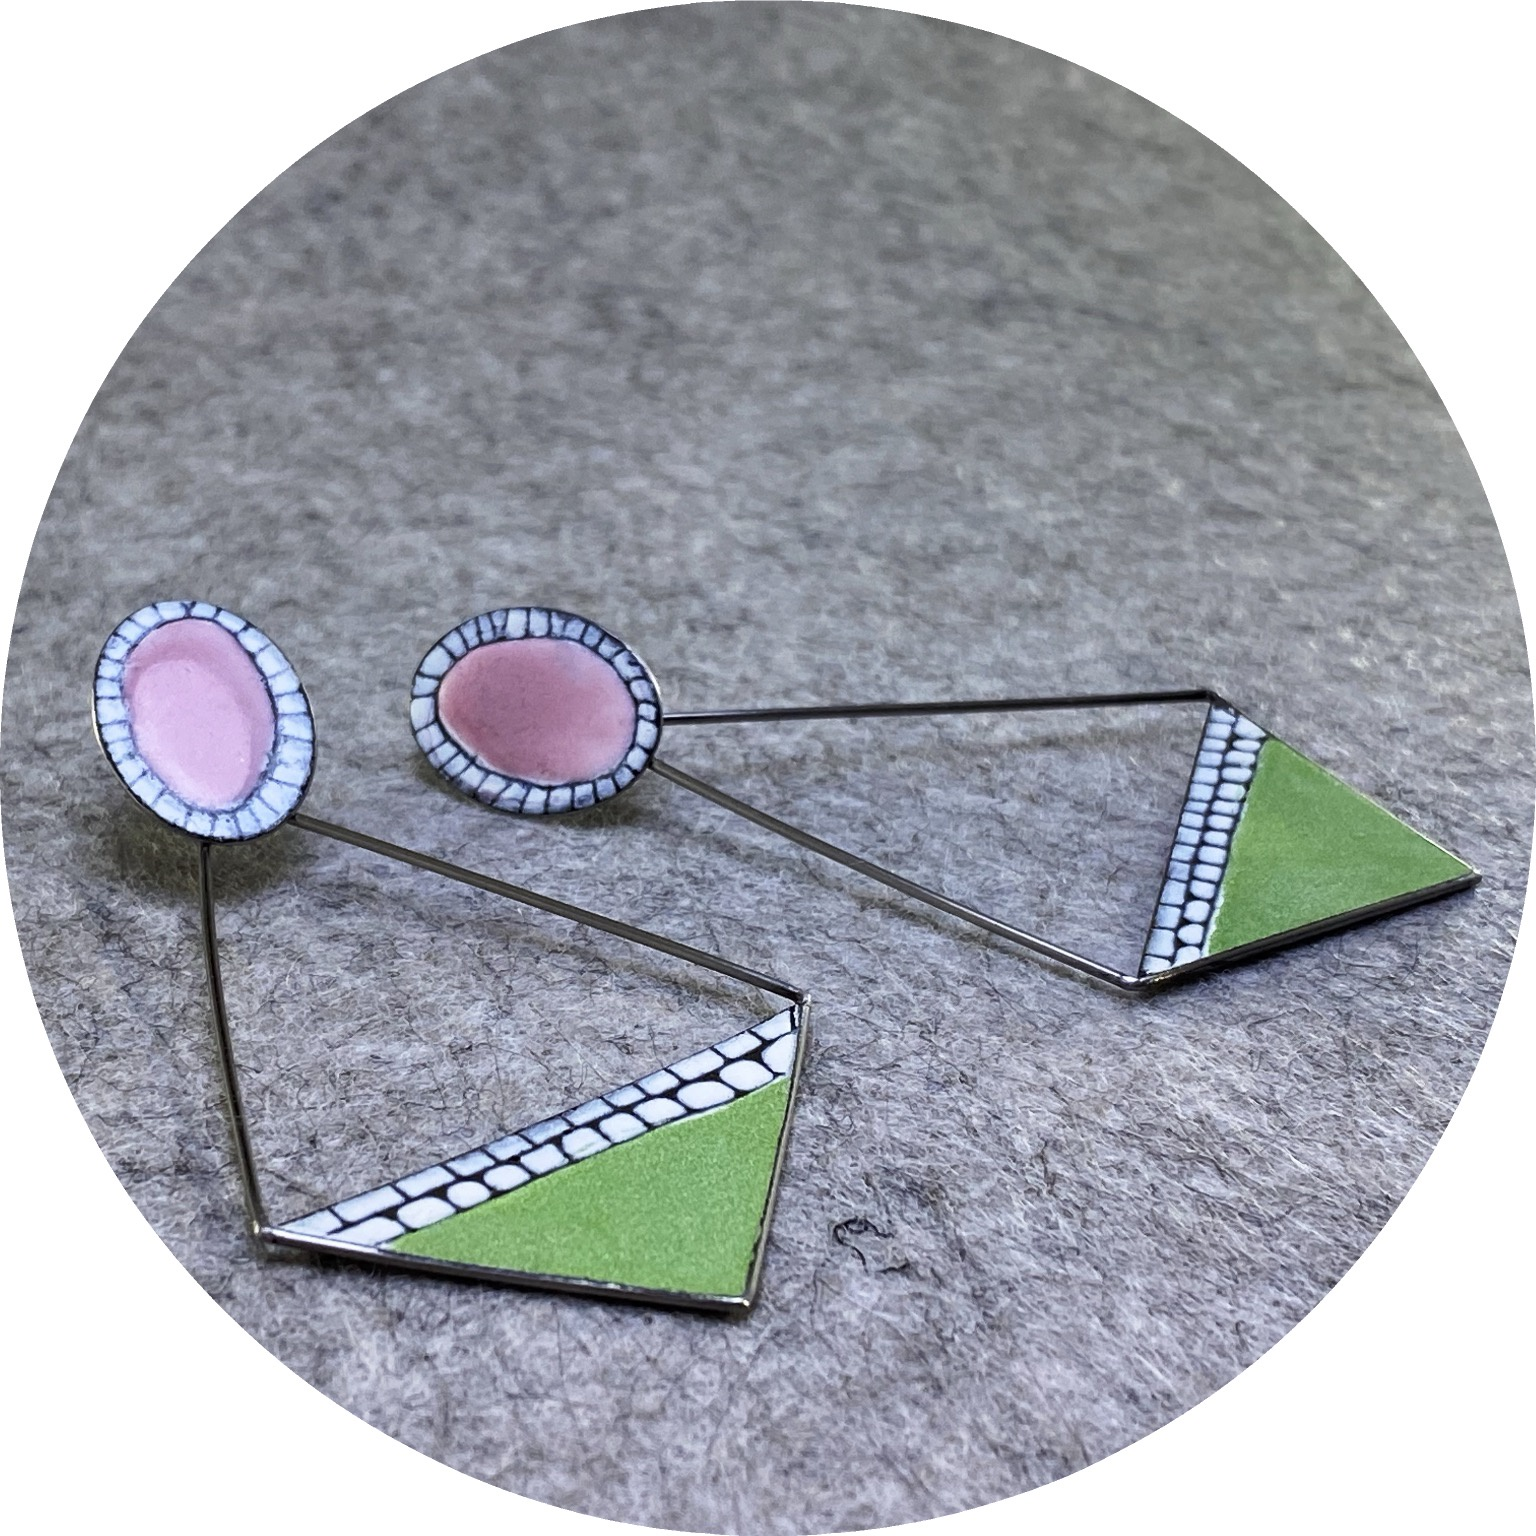 Sarah Murphy- Pendulum earrings. Pink, white & green enamel on stainless steel.